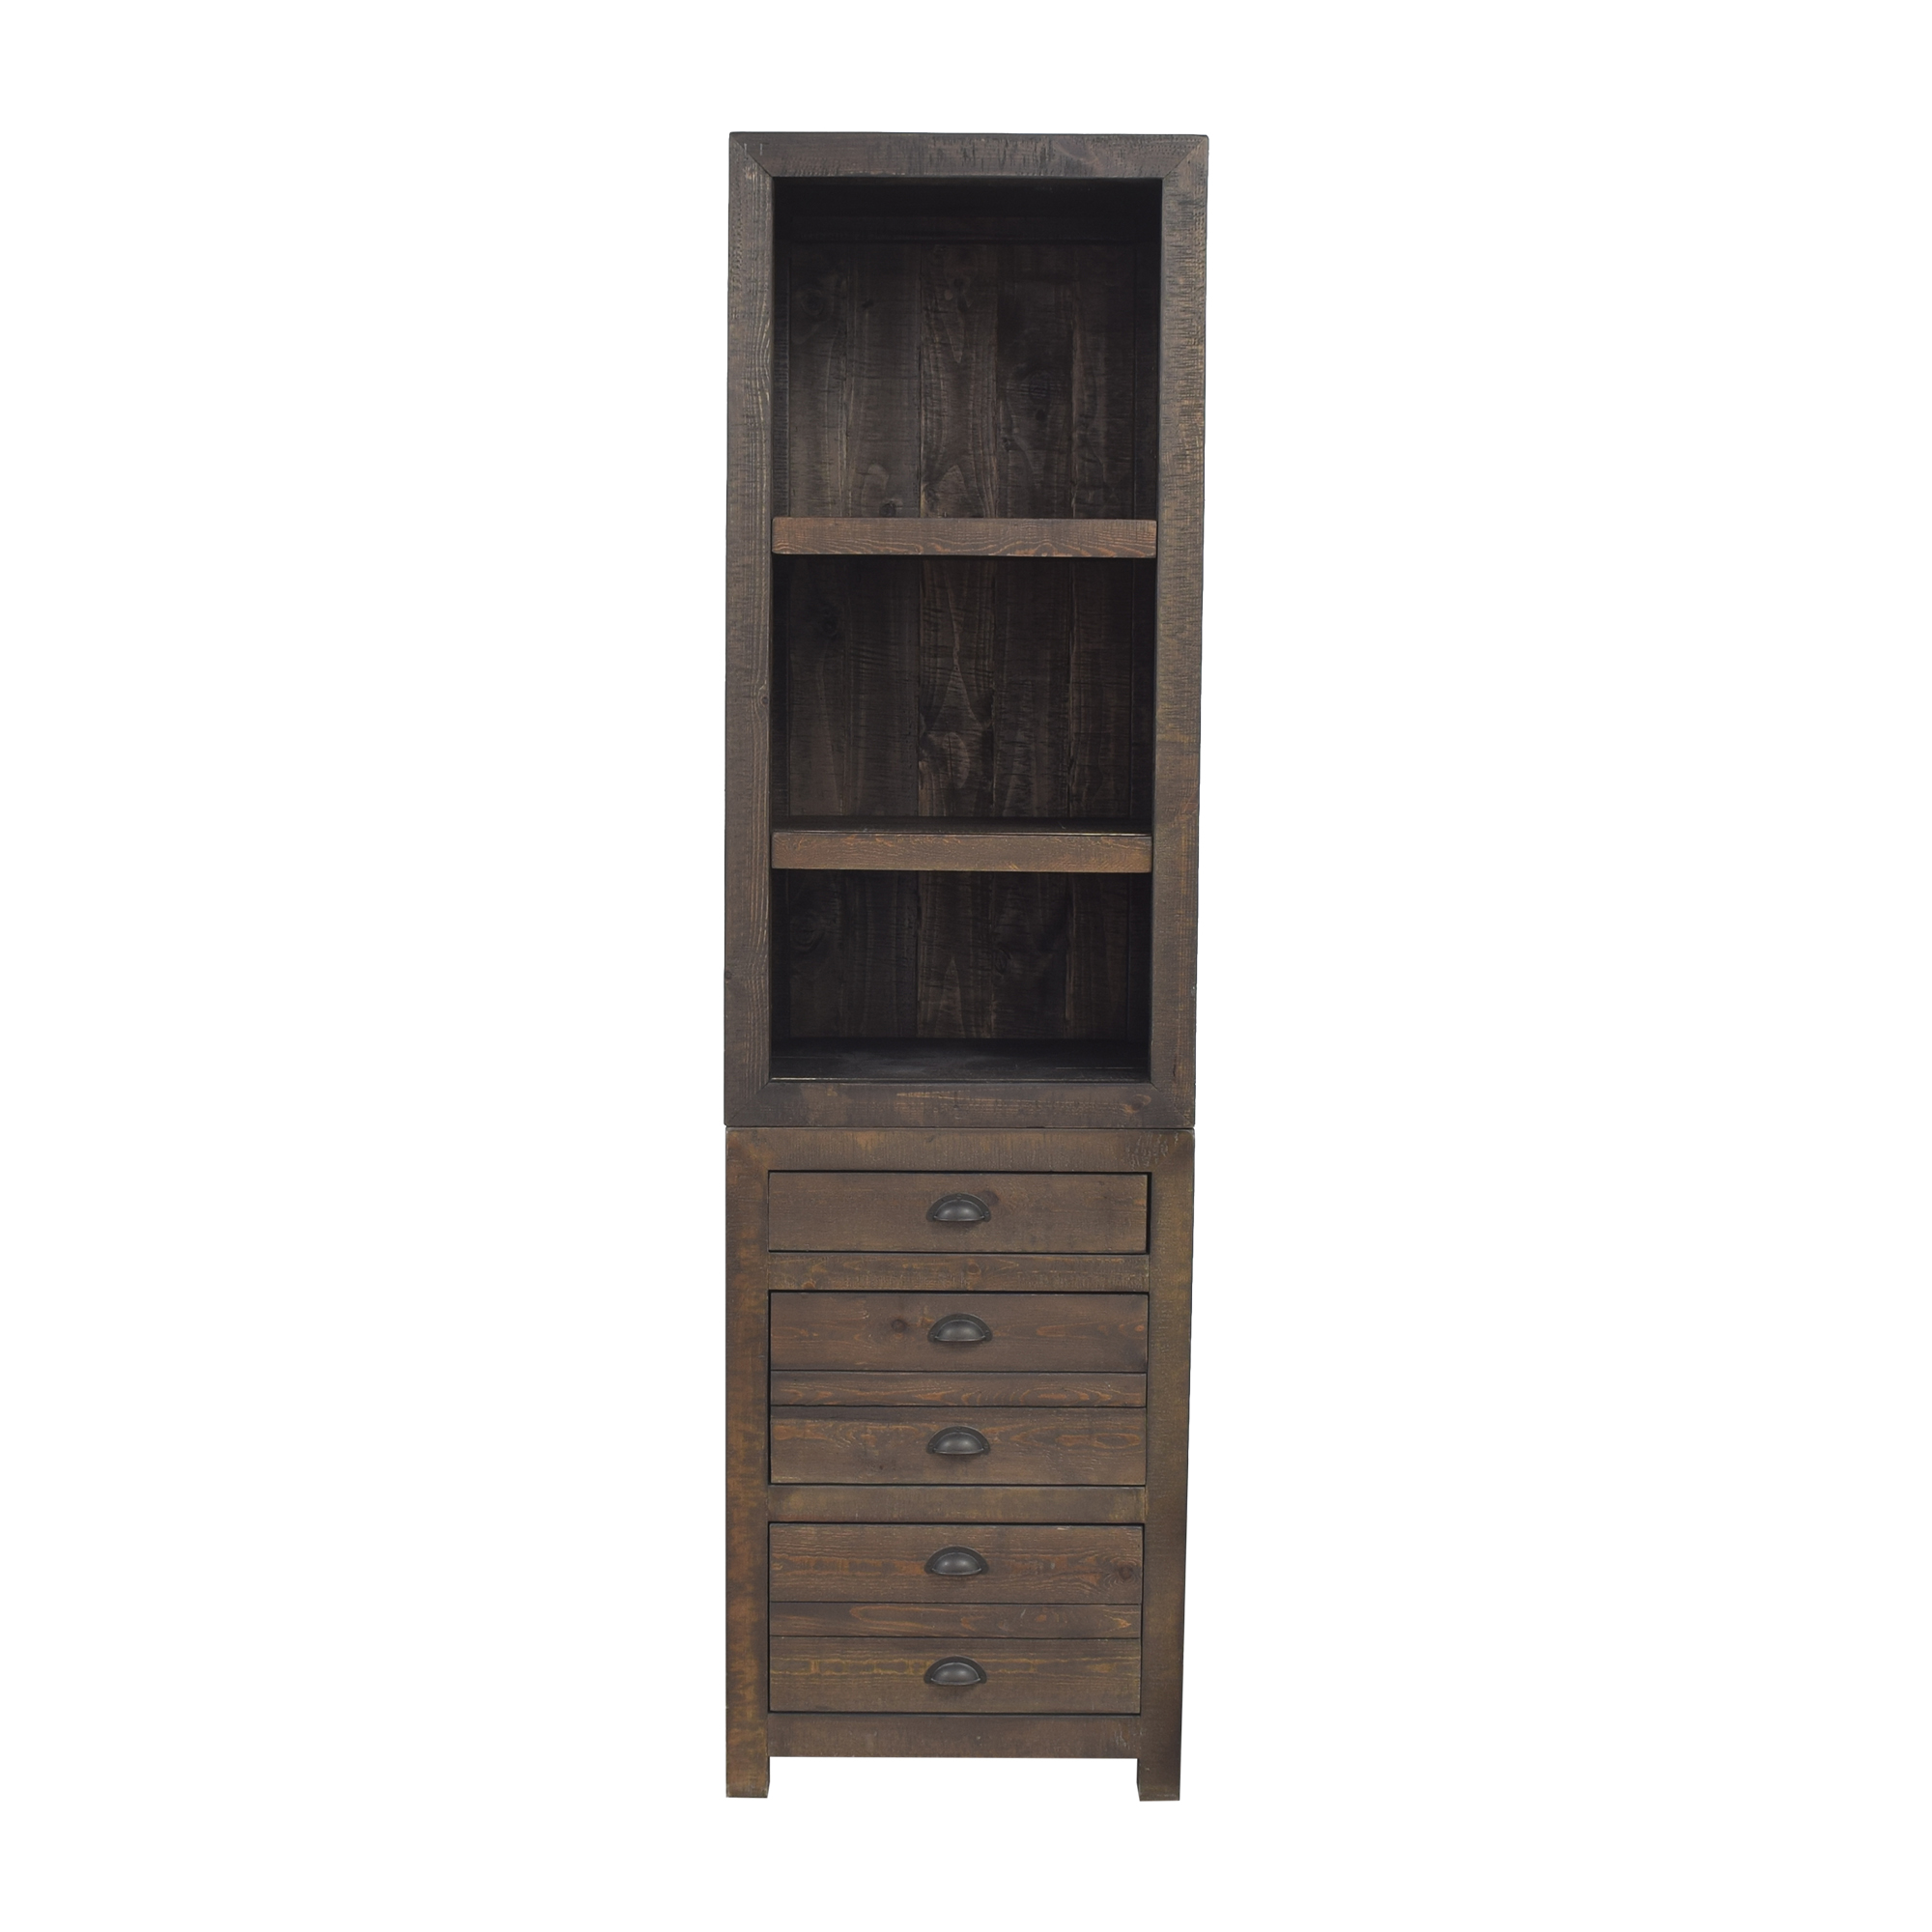 Restoration Hardware Teen Keynes Bookshelf / Bookcases & Shelving